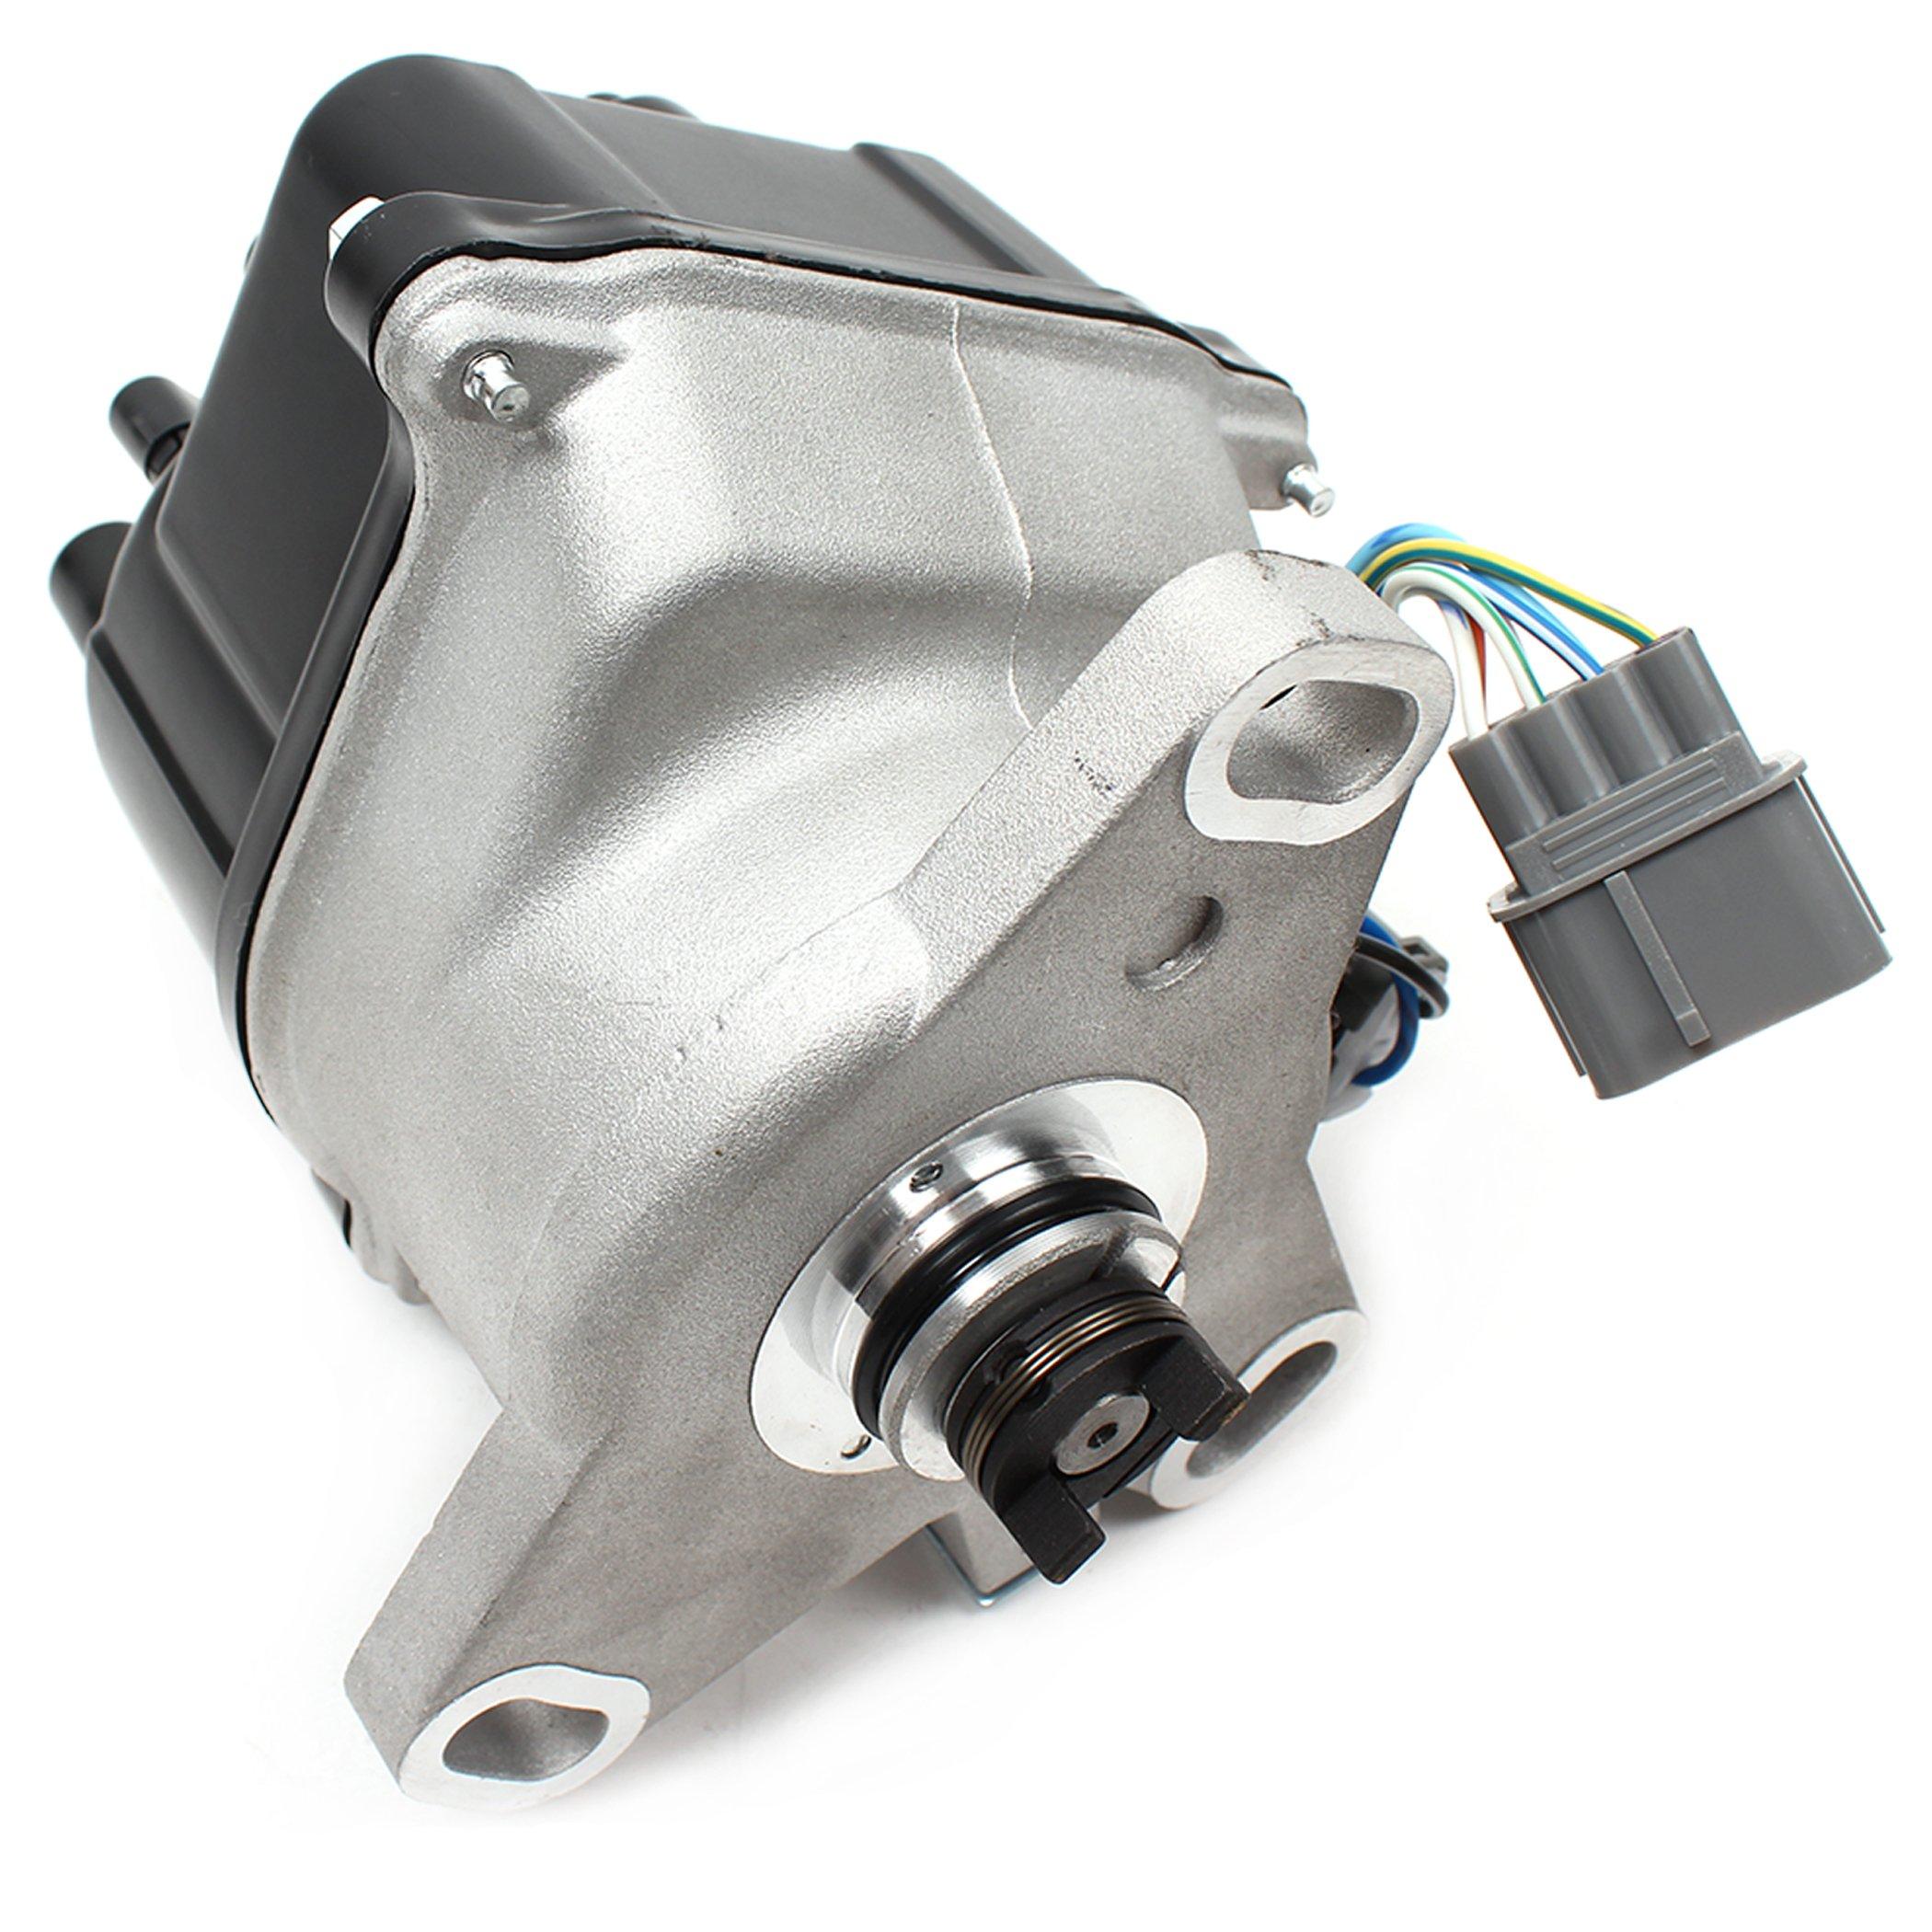 NIB Mercury 150-175-200-225 HP 2.4L V6 Stator 6 Wire 398-5454A7 18-5857 9-25502